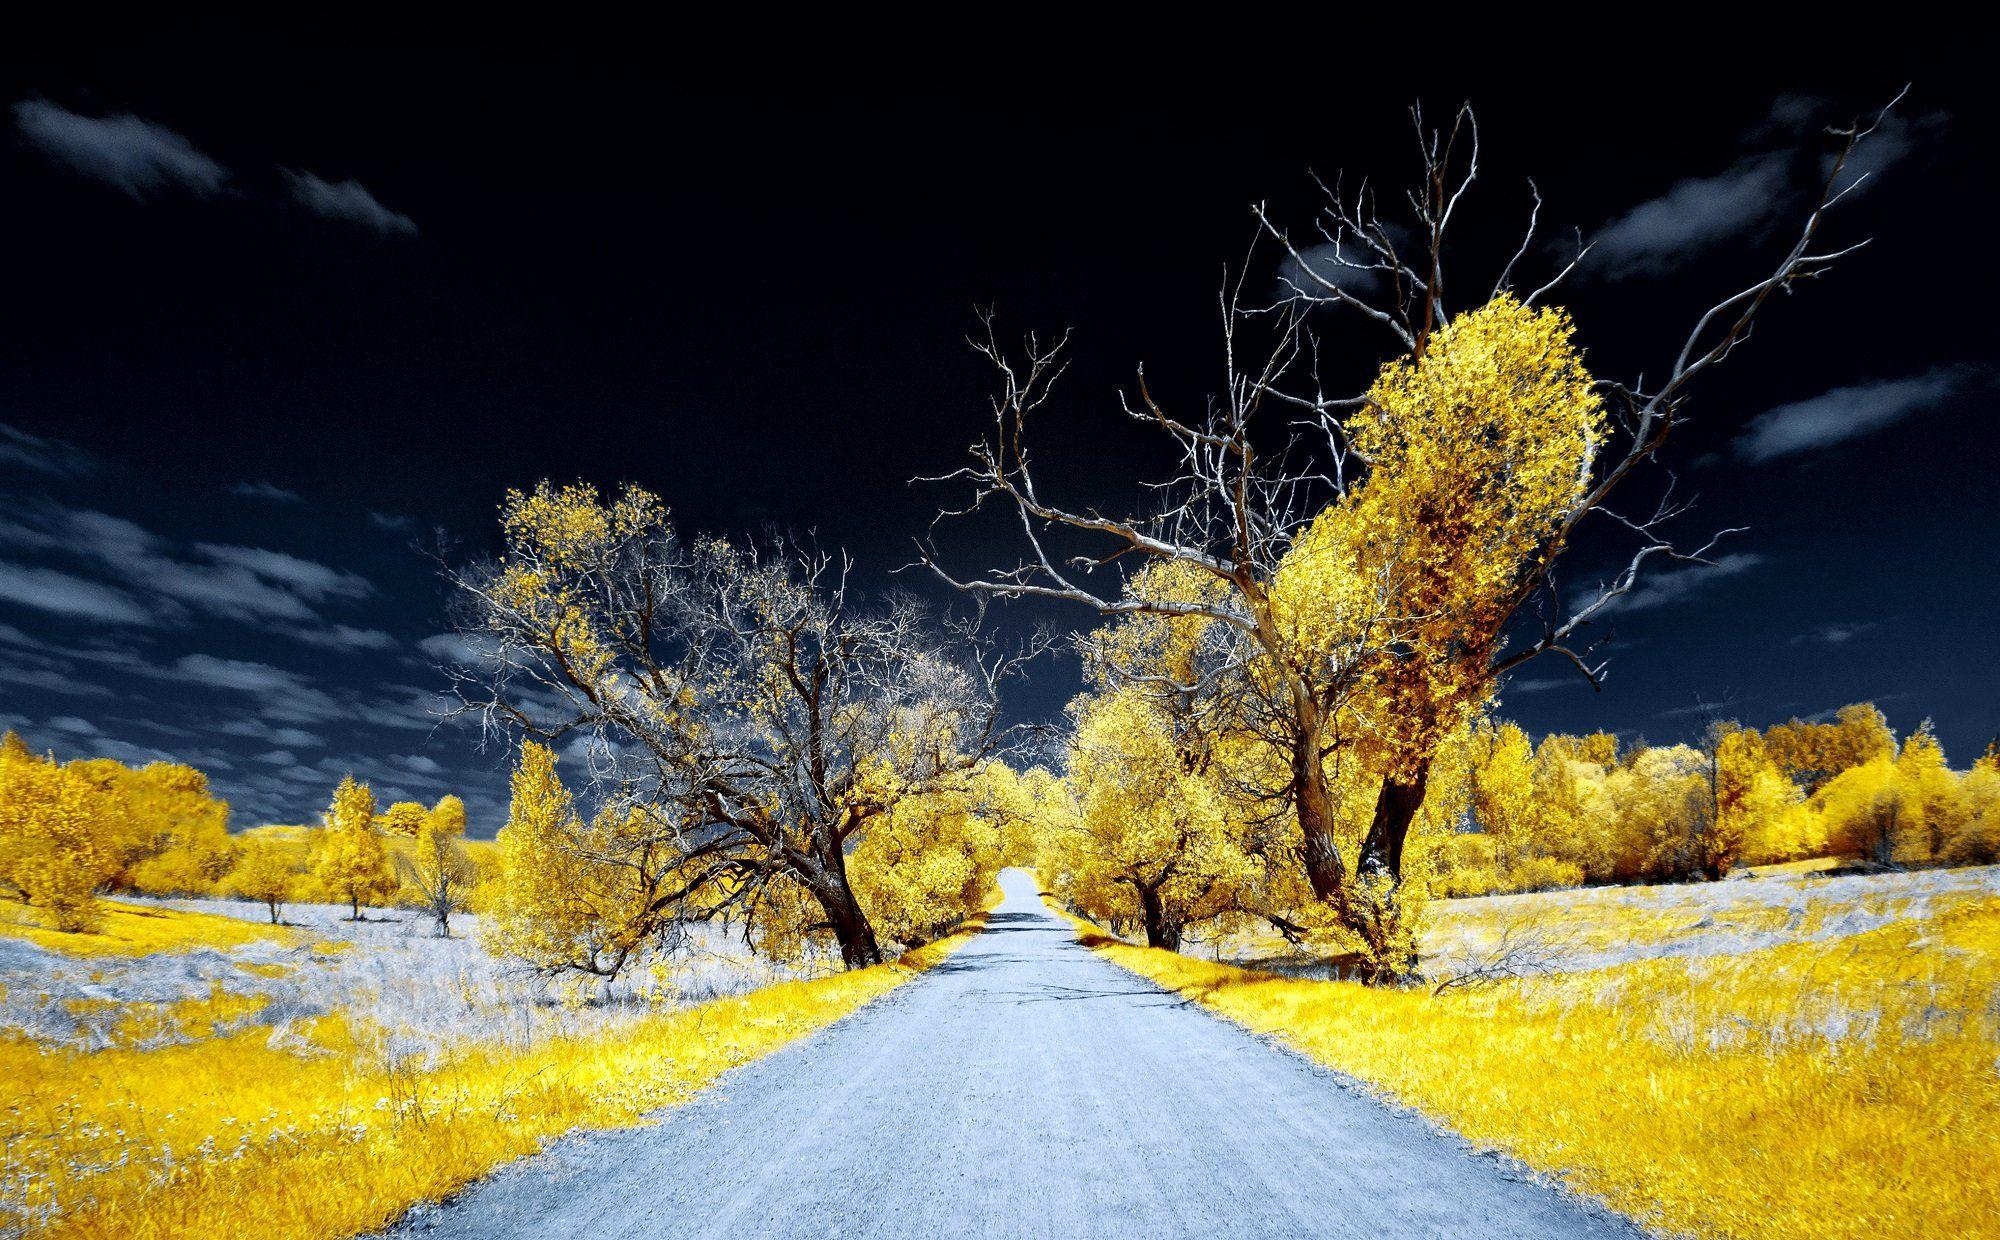 infrared,ик-фото,инфракрасное фото,инфракрасная фотография,пейзаж,природа,беларусь,весна,инфракрасная съемка, Sixten ( Сергей )